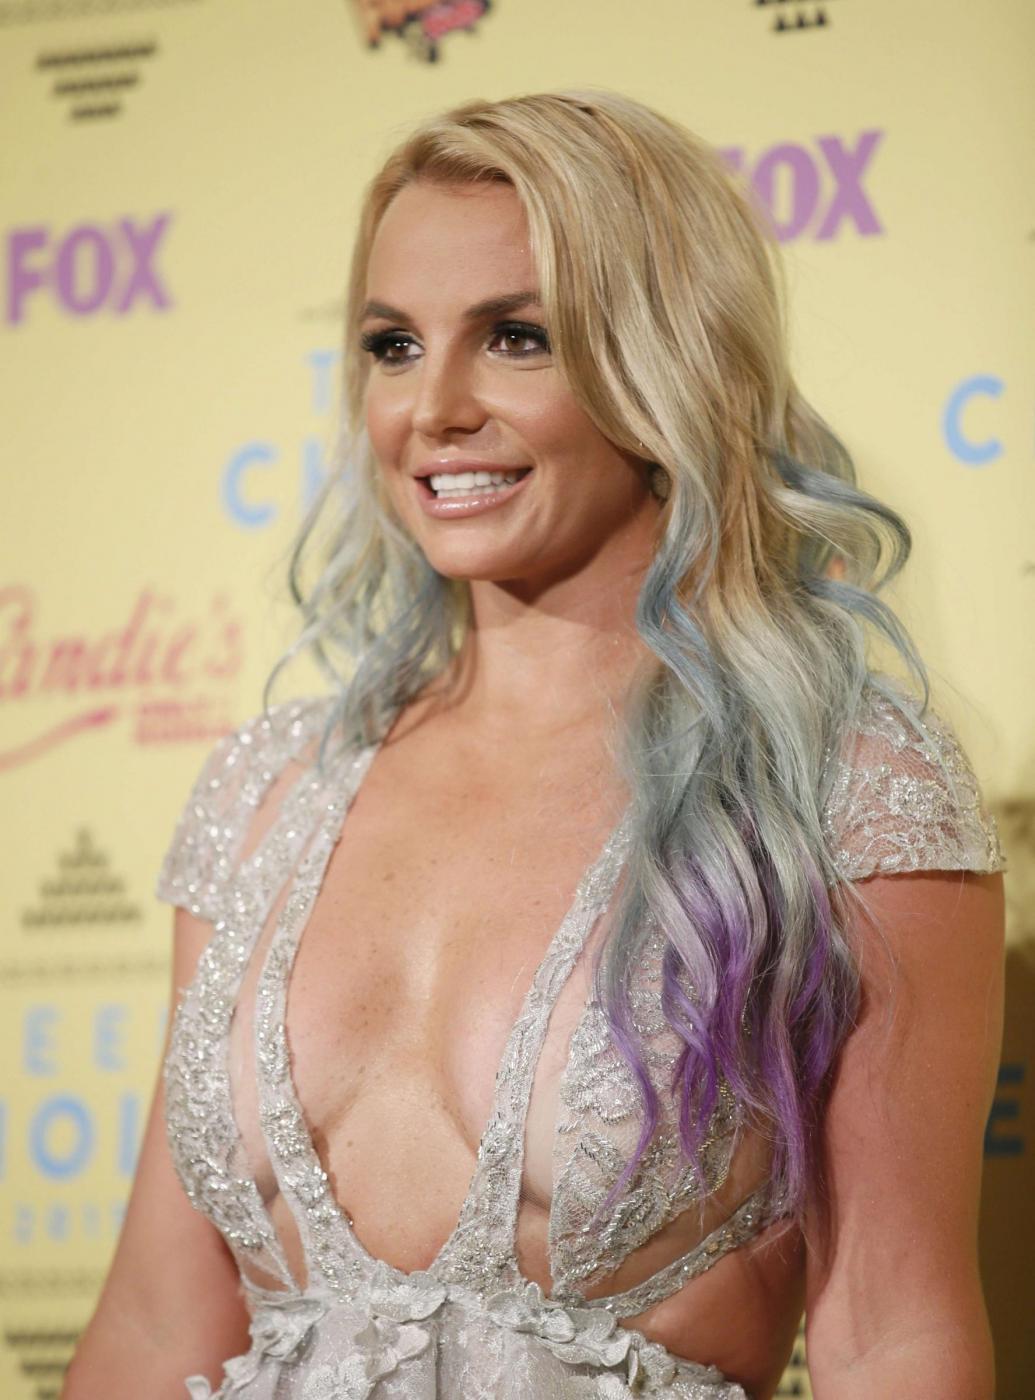 Britney Spears, abito scollato ai Teen Choice Awards 6